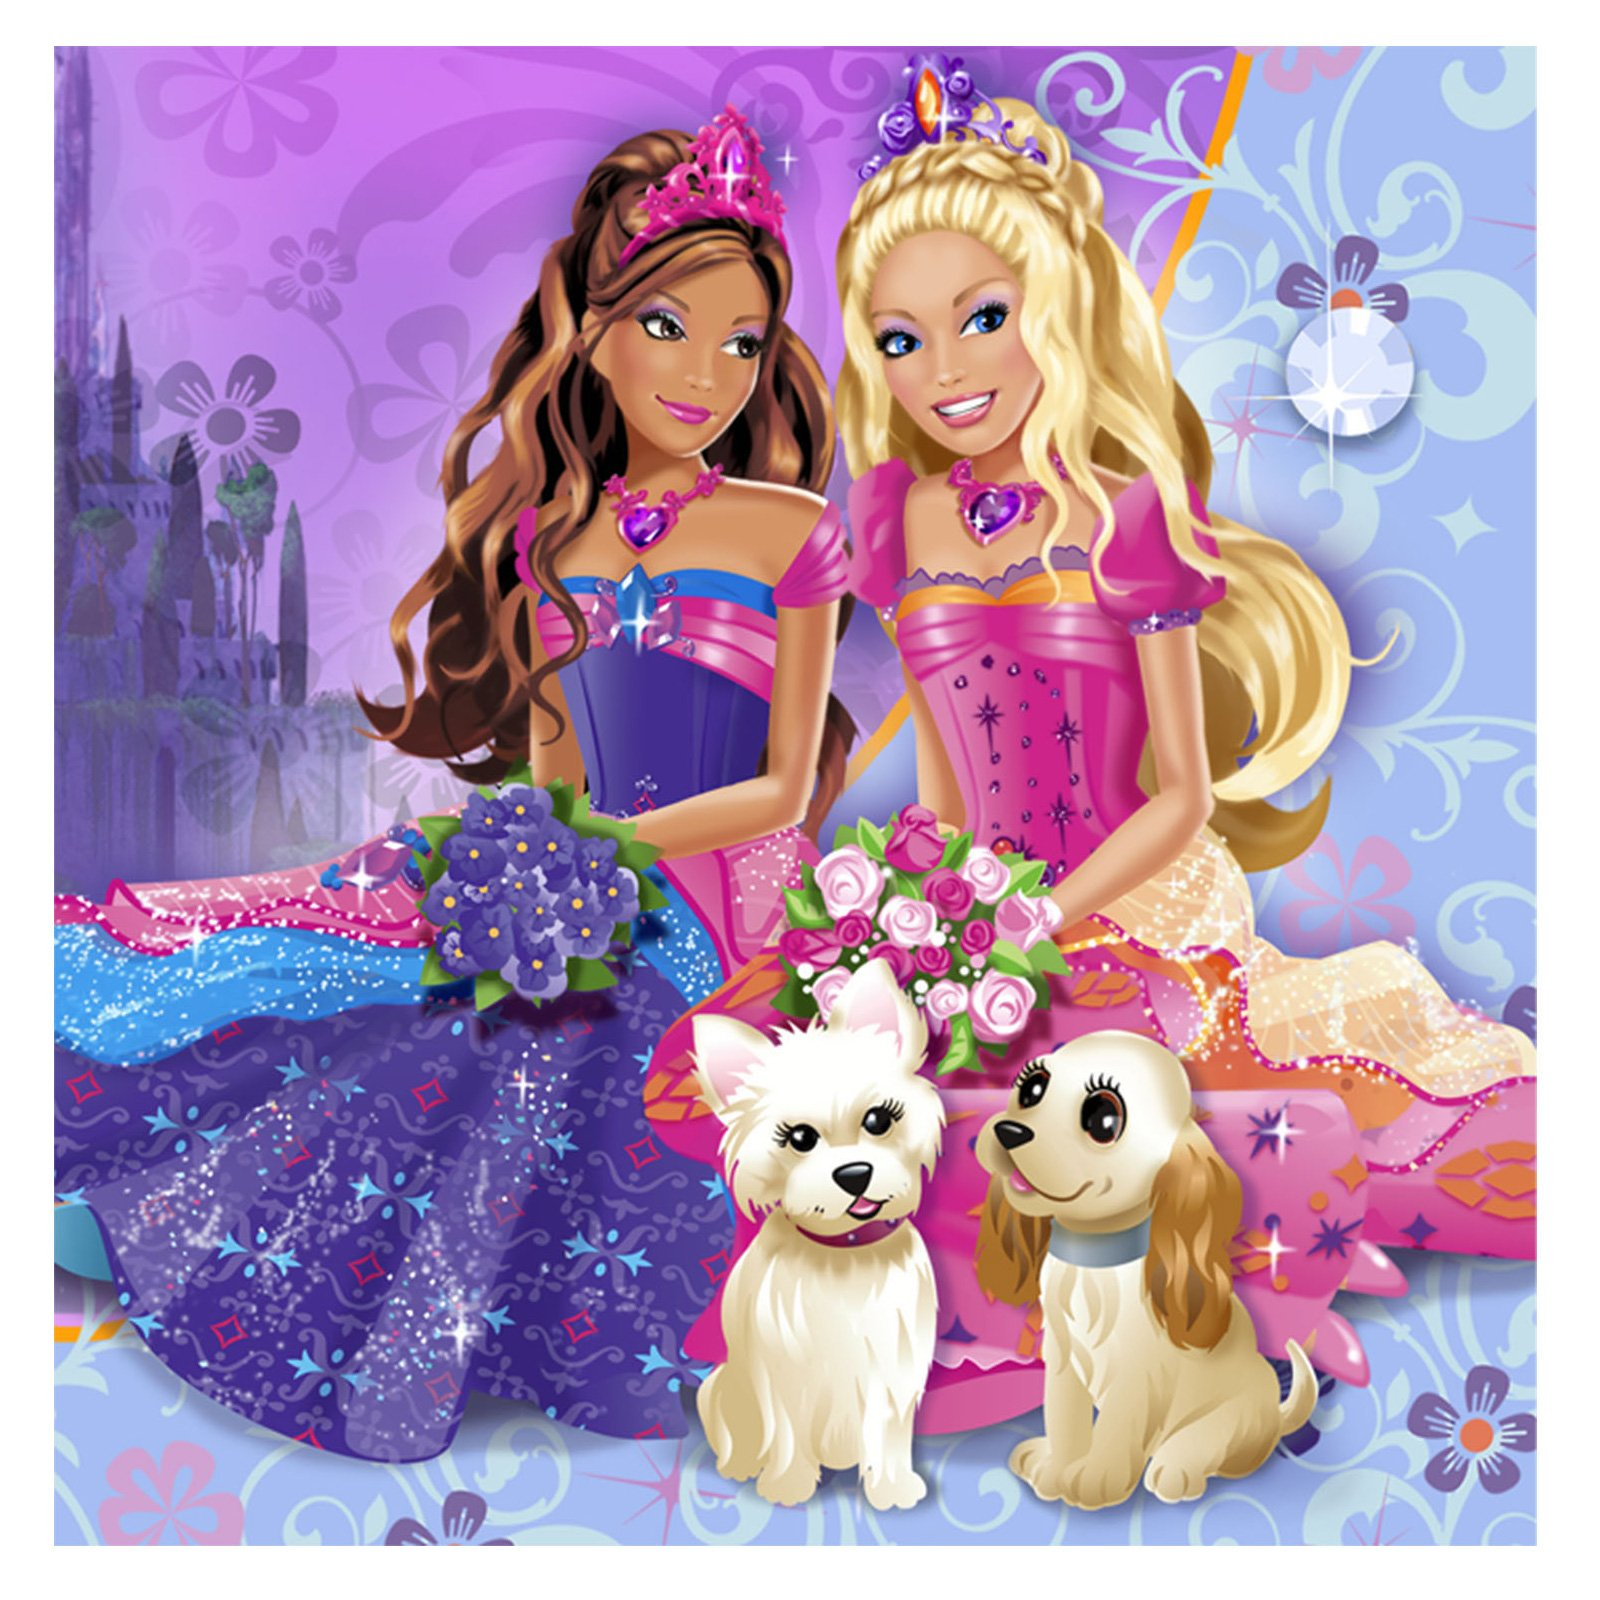 barbie cute wallpapers for desktop